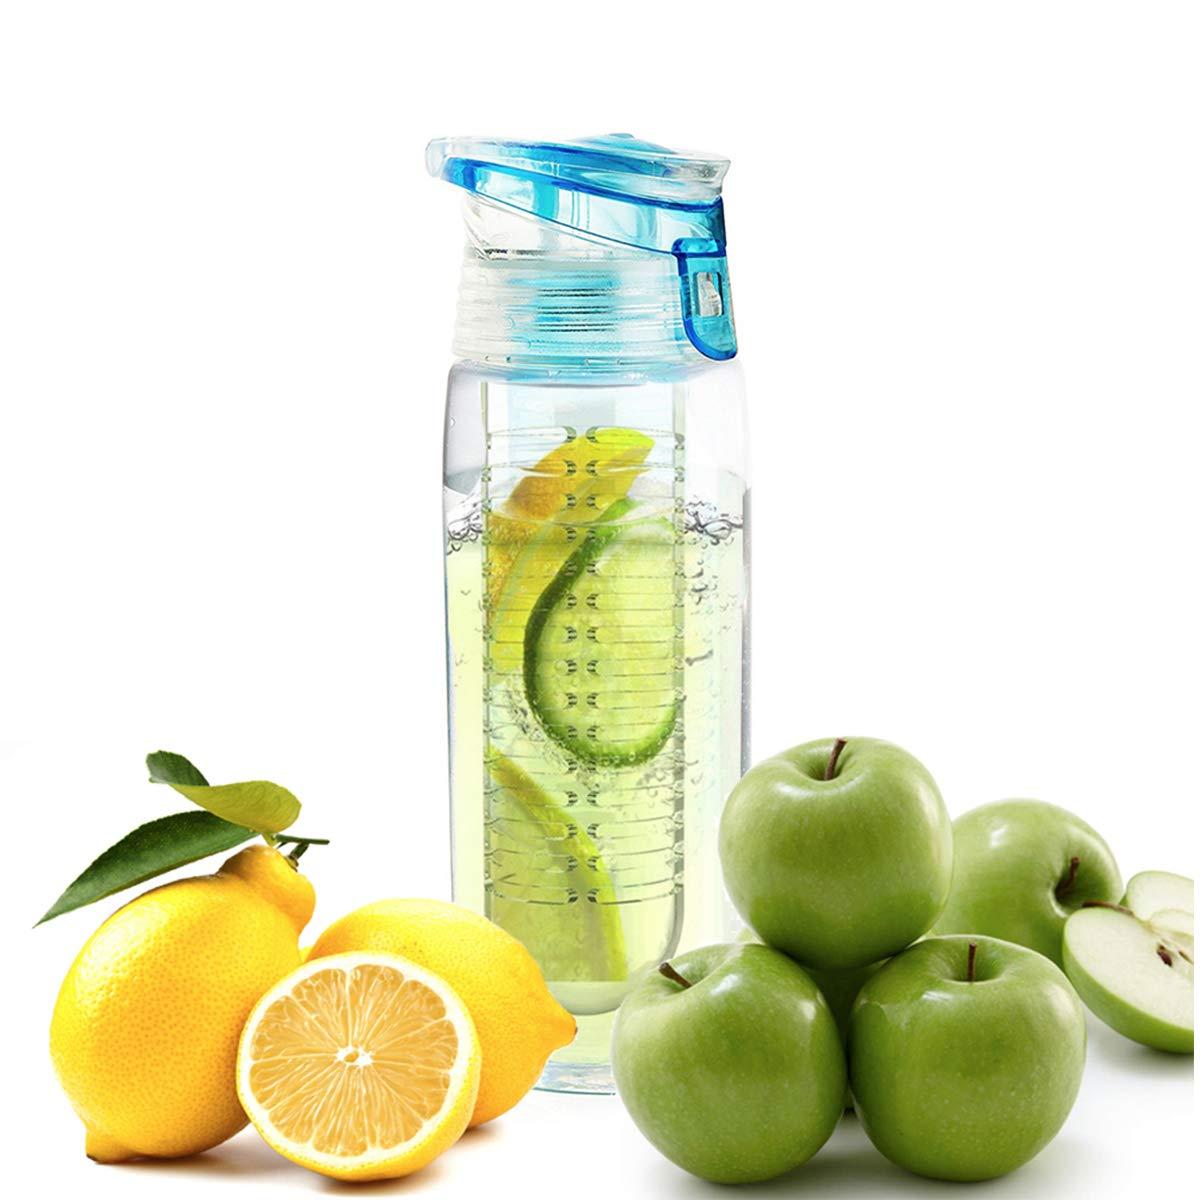 Asobu BTA712-8627 Revolutionary Pure Fruit Flavour 2 Go Water Infuser Bottle, Sky Blue Ad-n-art